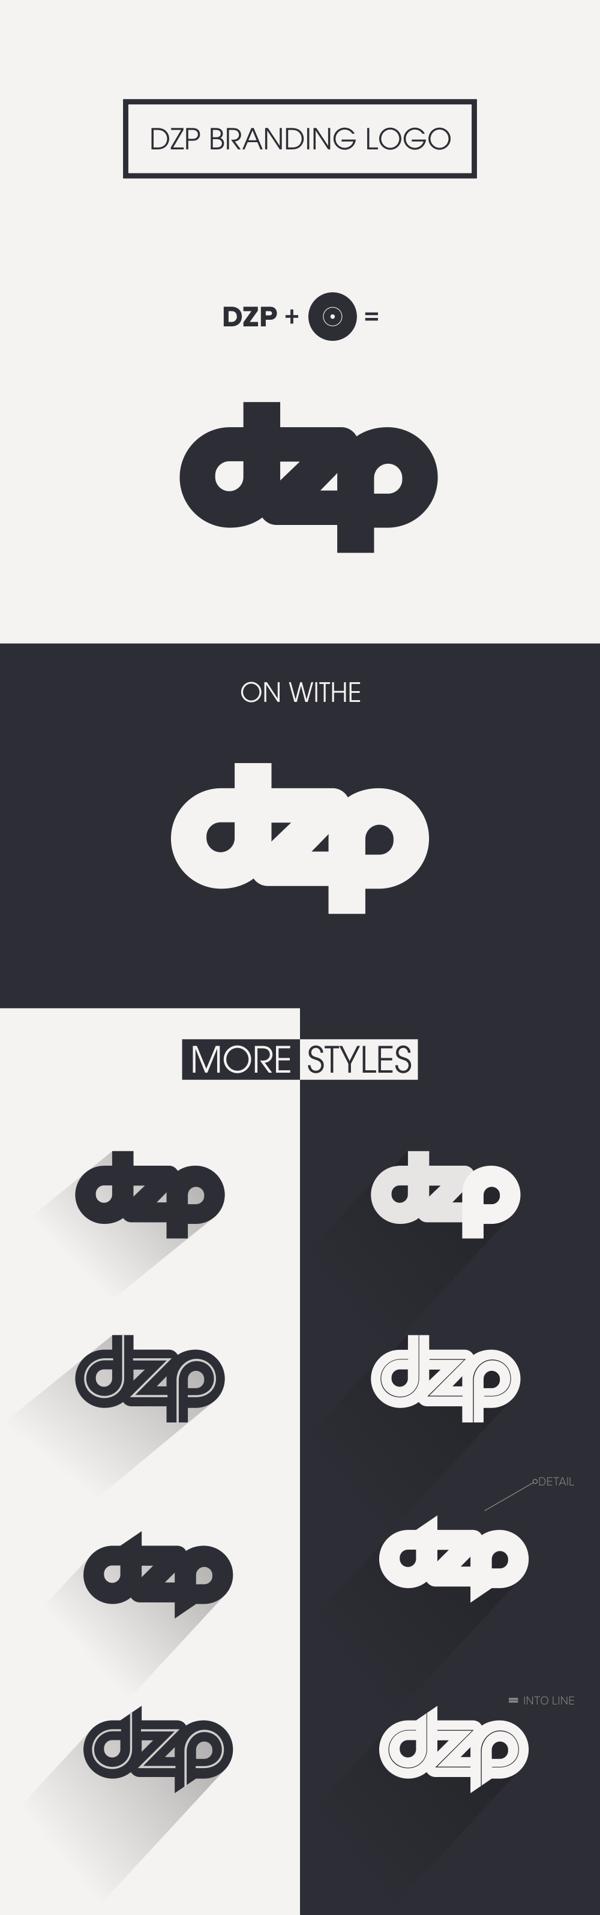 DZP Branding Logo